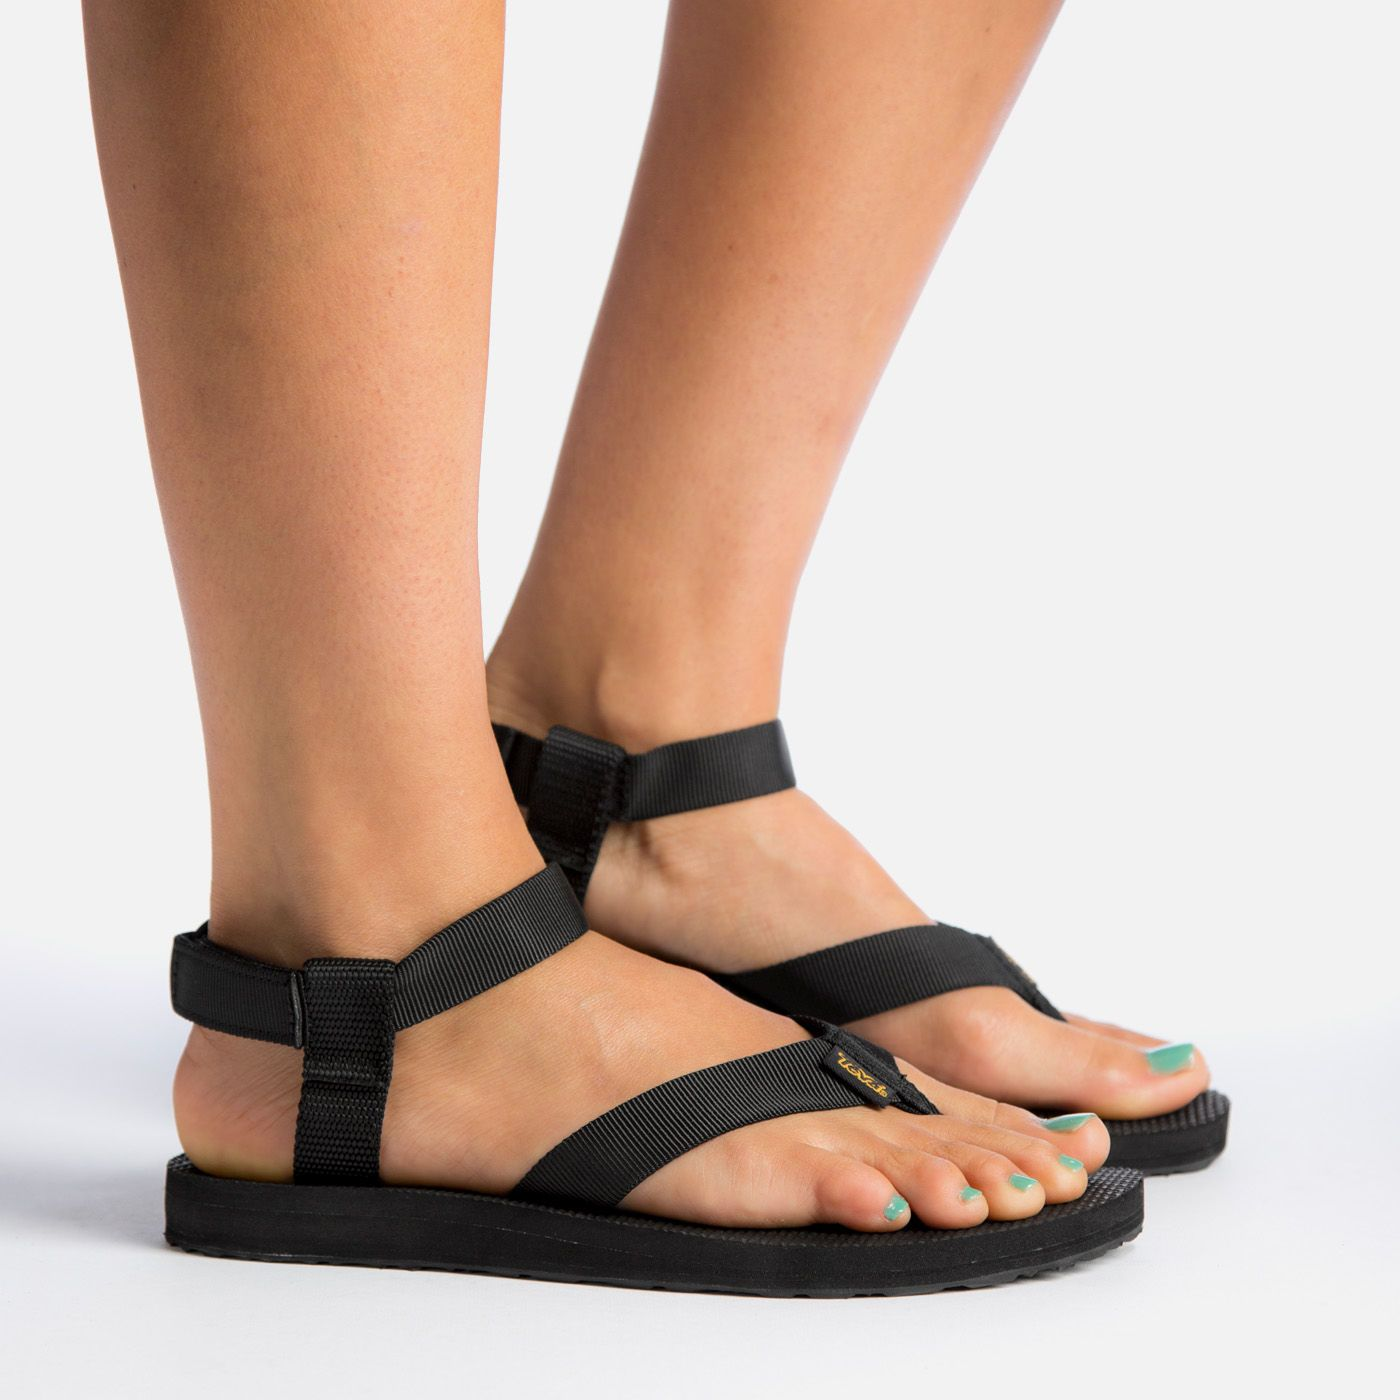 Teva Womens Original Universal Leather Metallic Open Toe Casual Sport Sandals